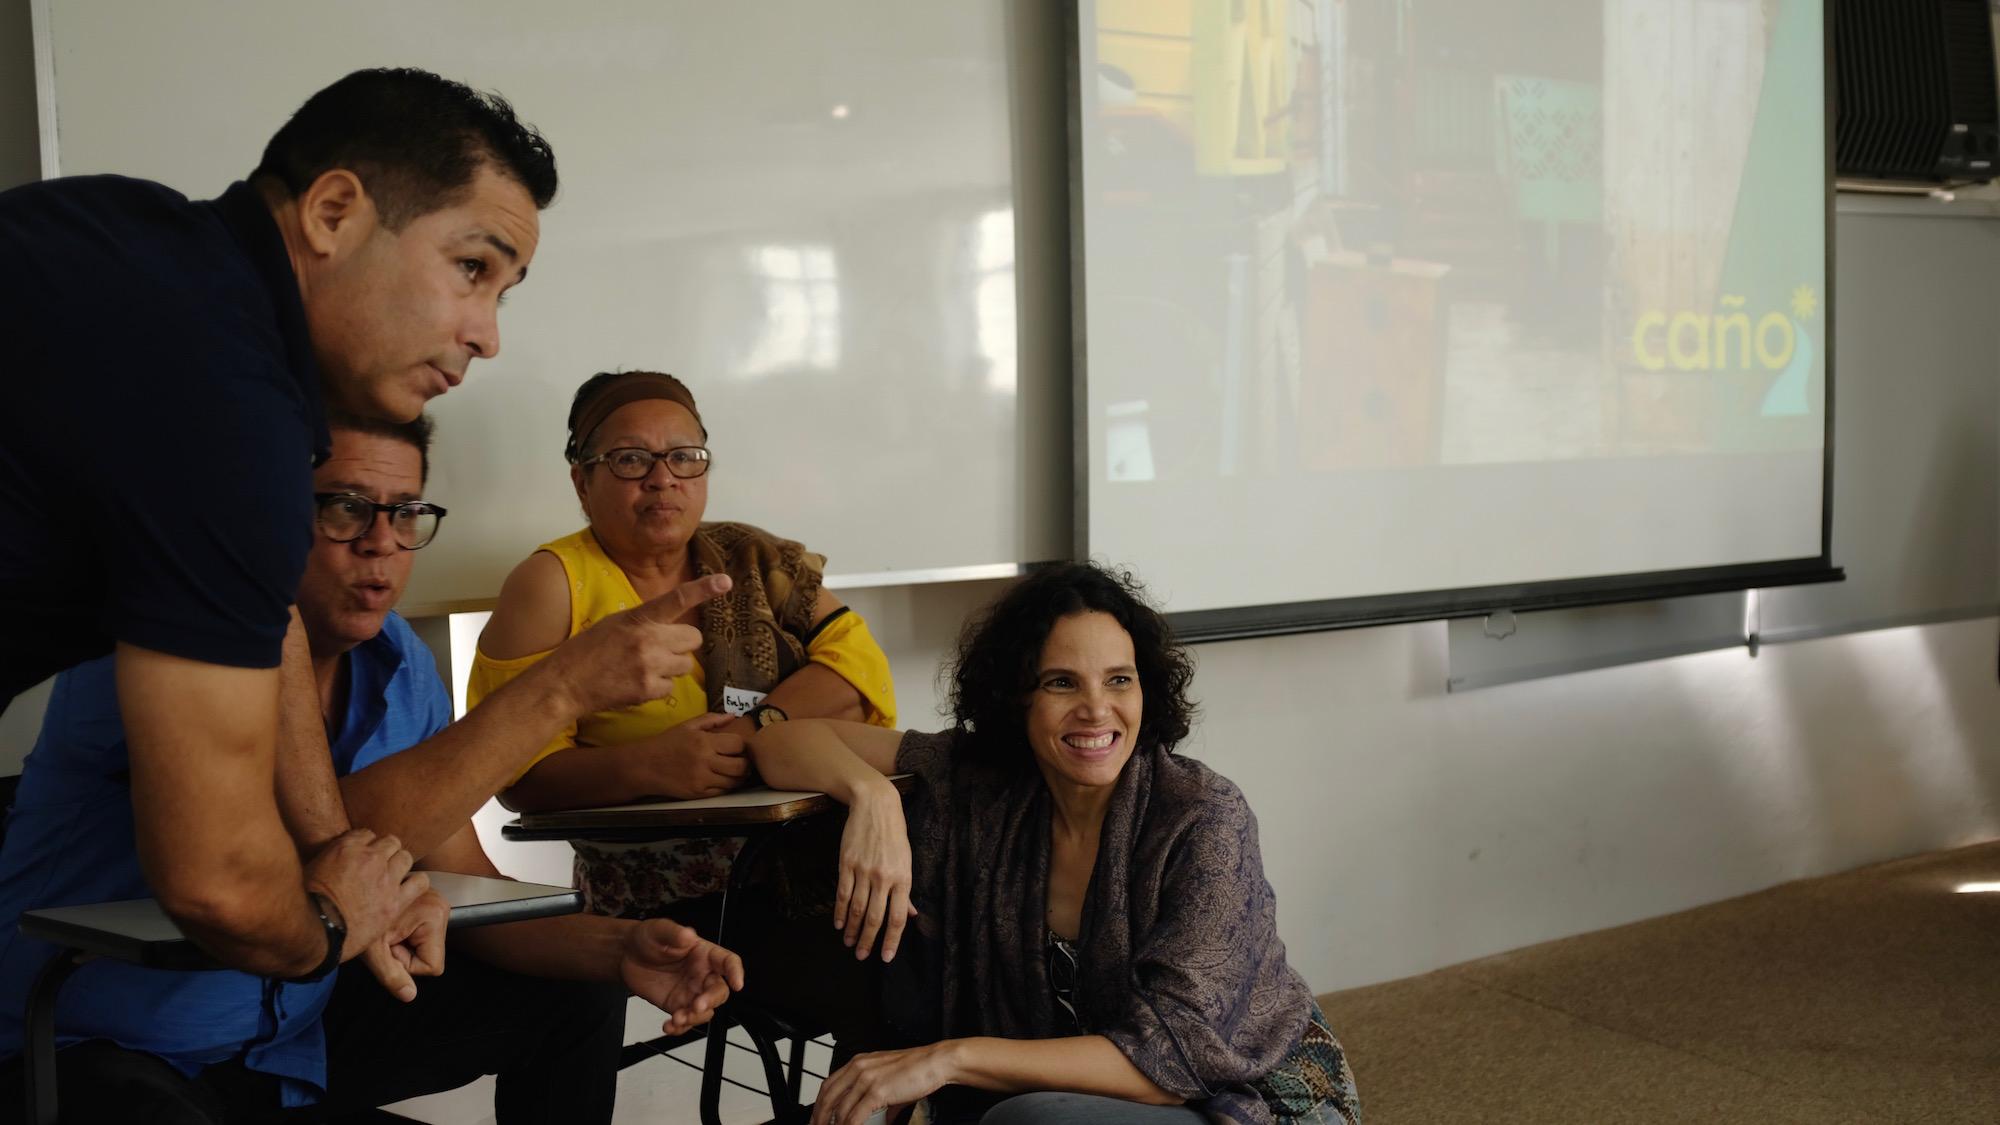 Equipe do Caño Martín Peña compartilha suas experiências. Foto por Line Algoed